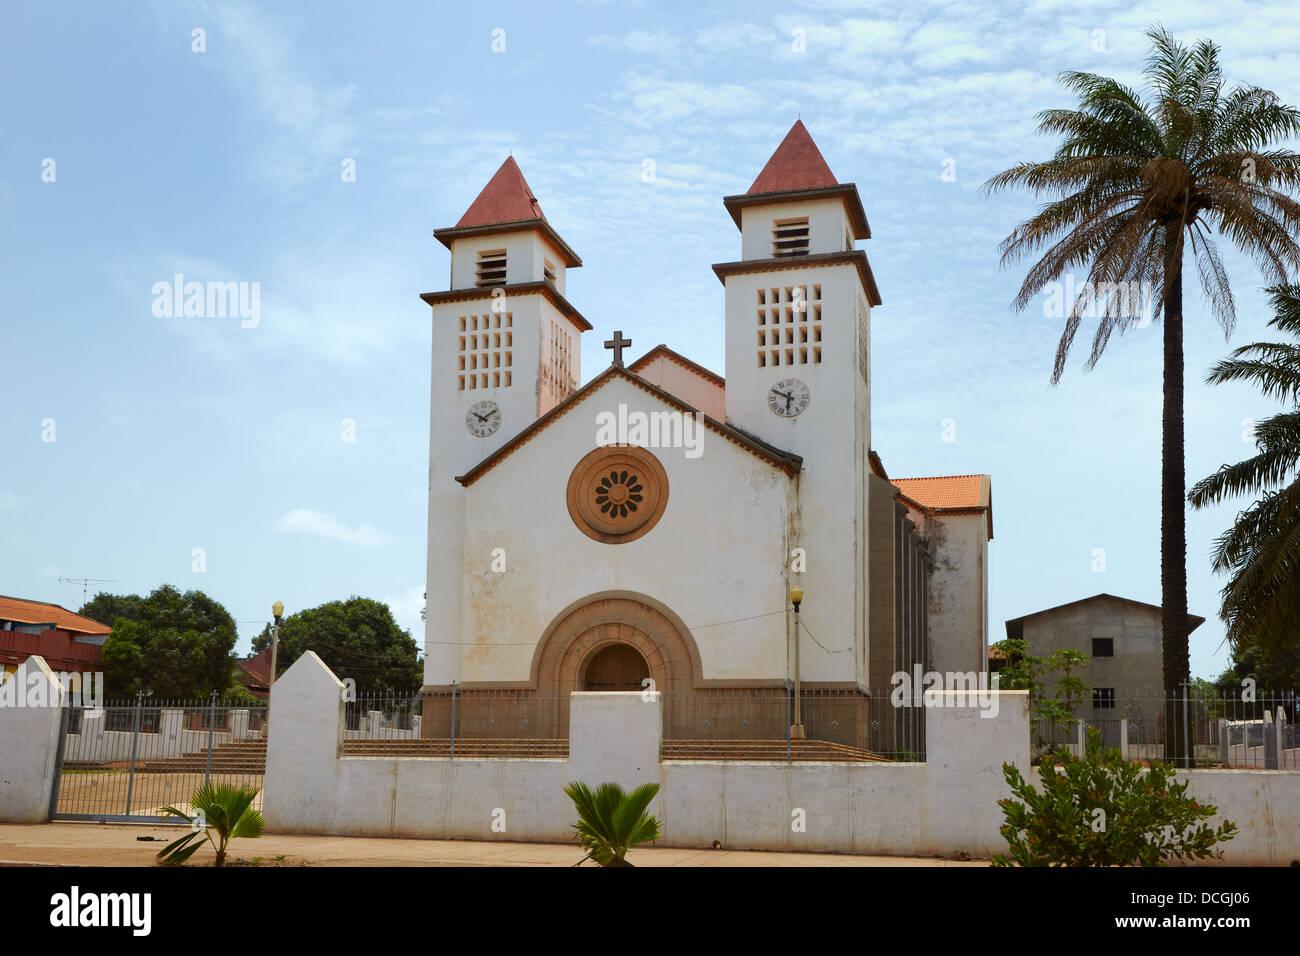 Catedral de Bissau, Bissau, Guinea-Bissau, Africa - Stock Image